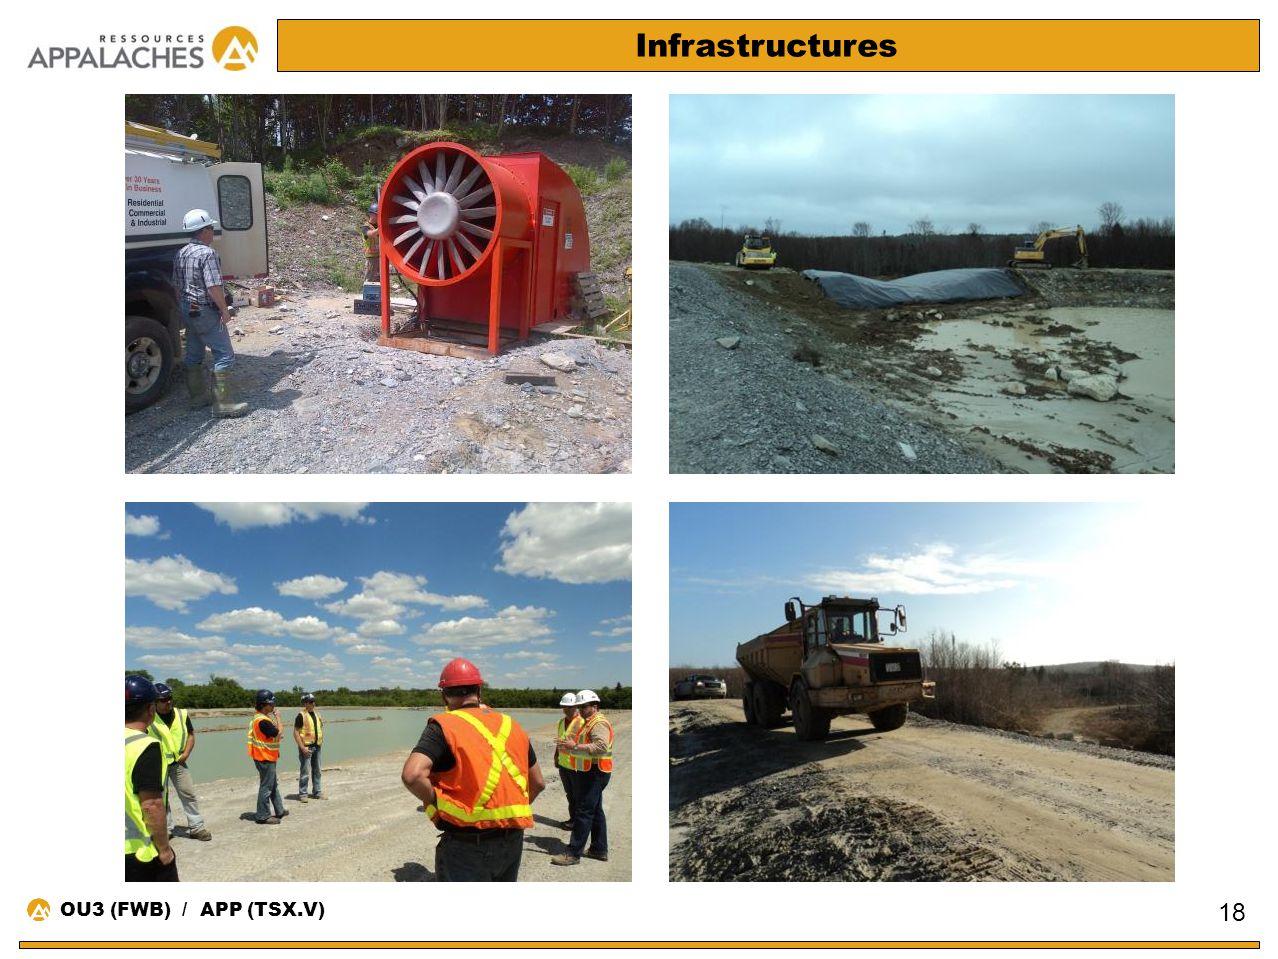 Infrastructures 18 OU3 (FWB) / APP (TSX.V)